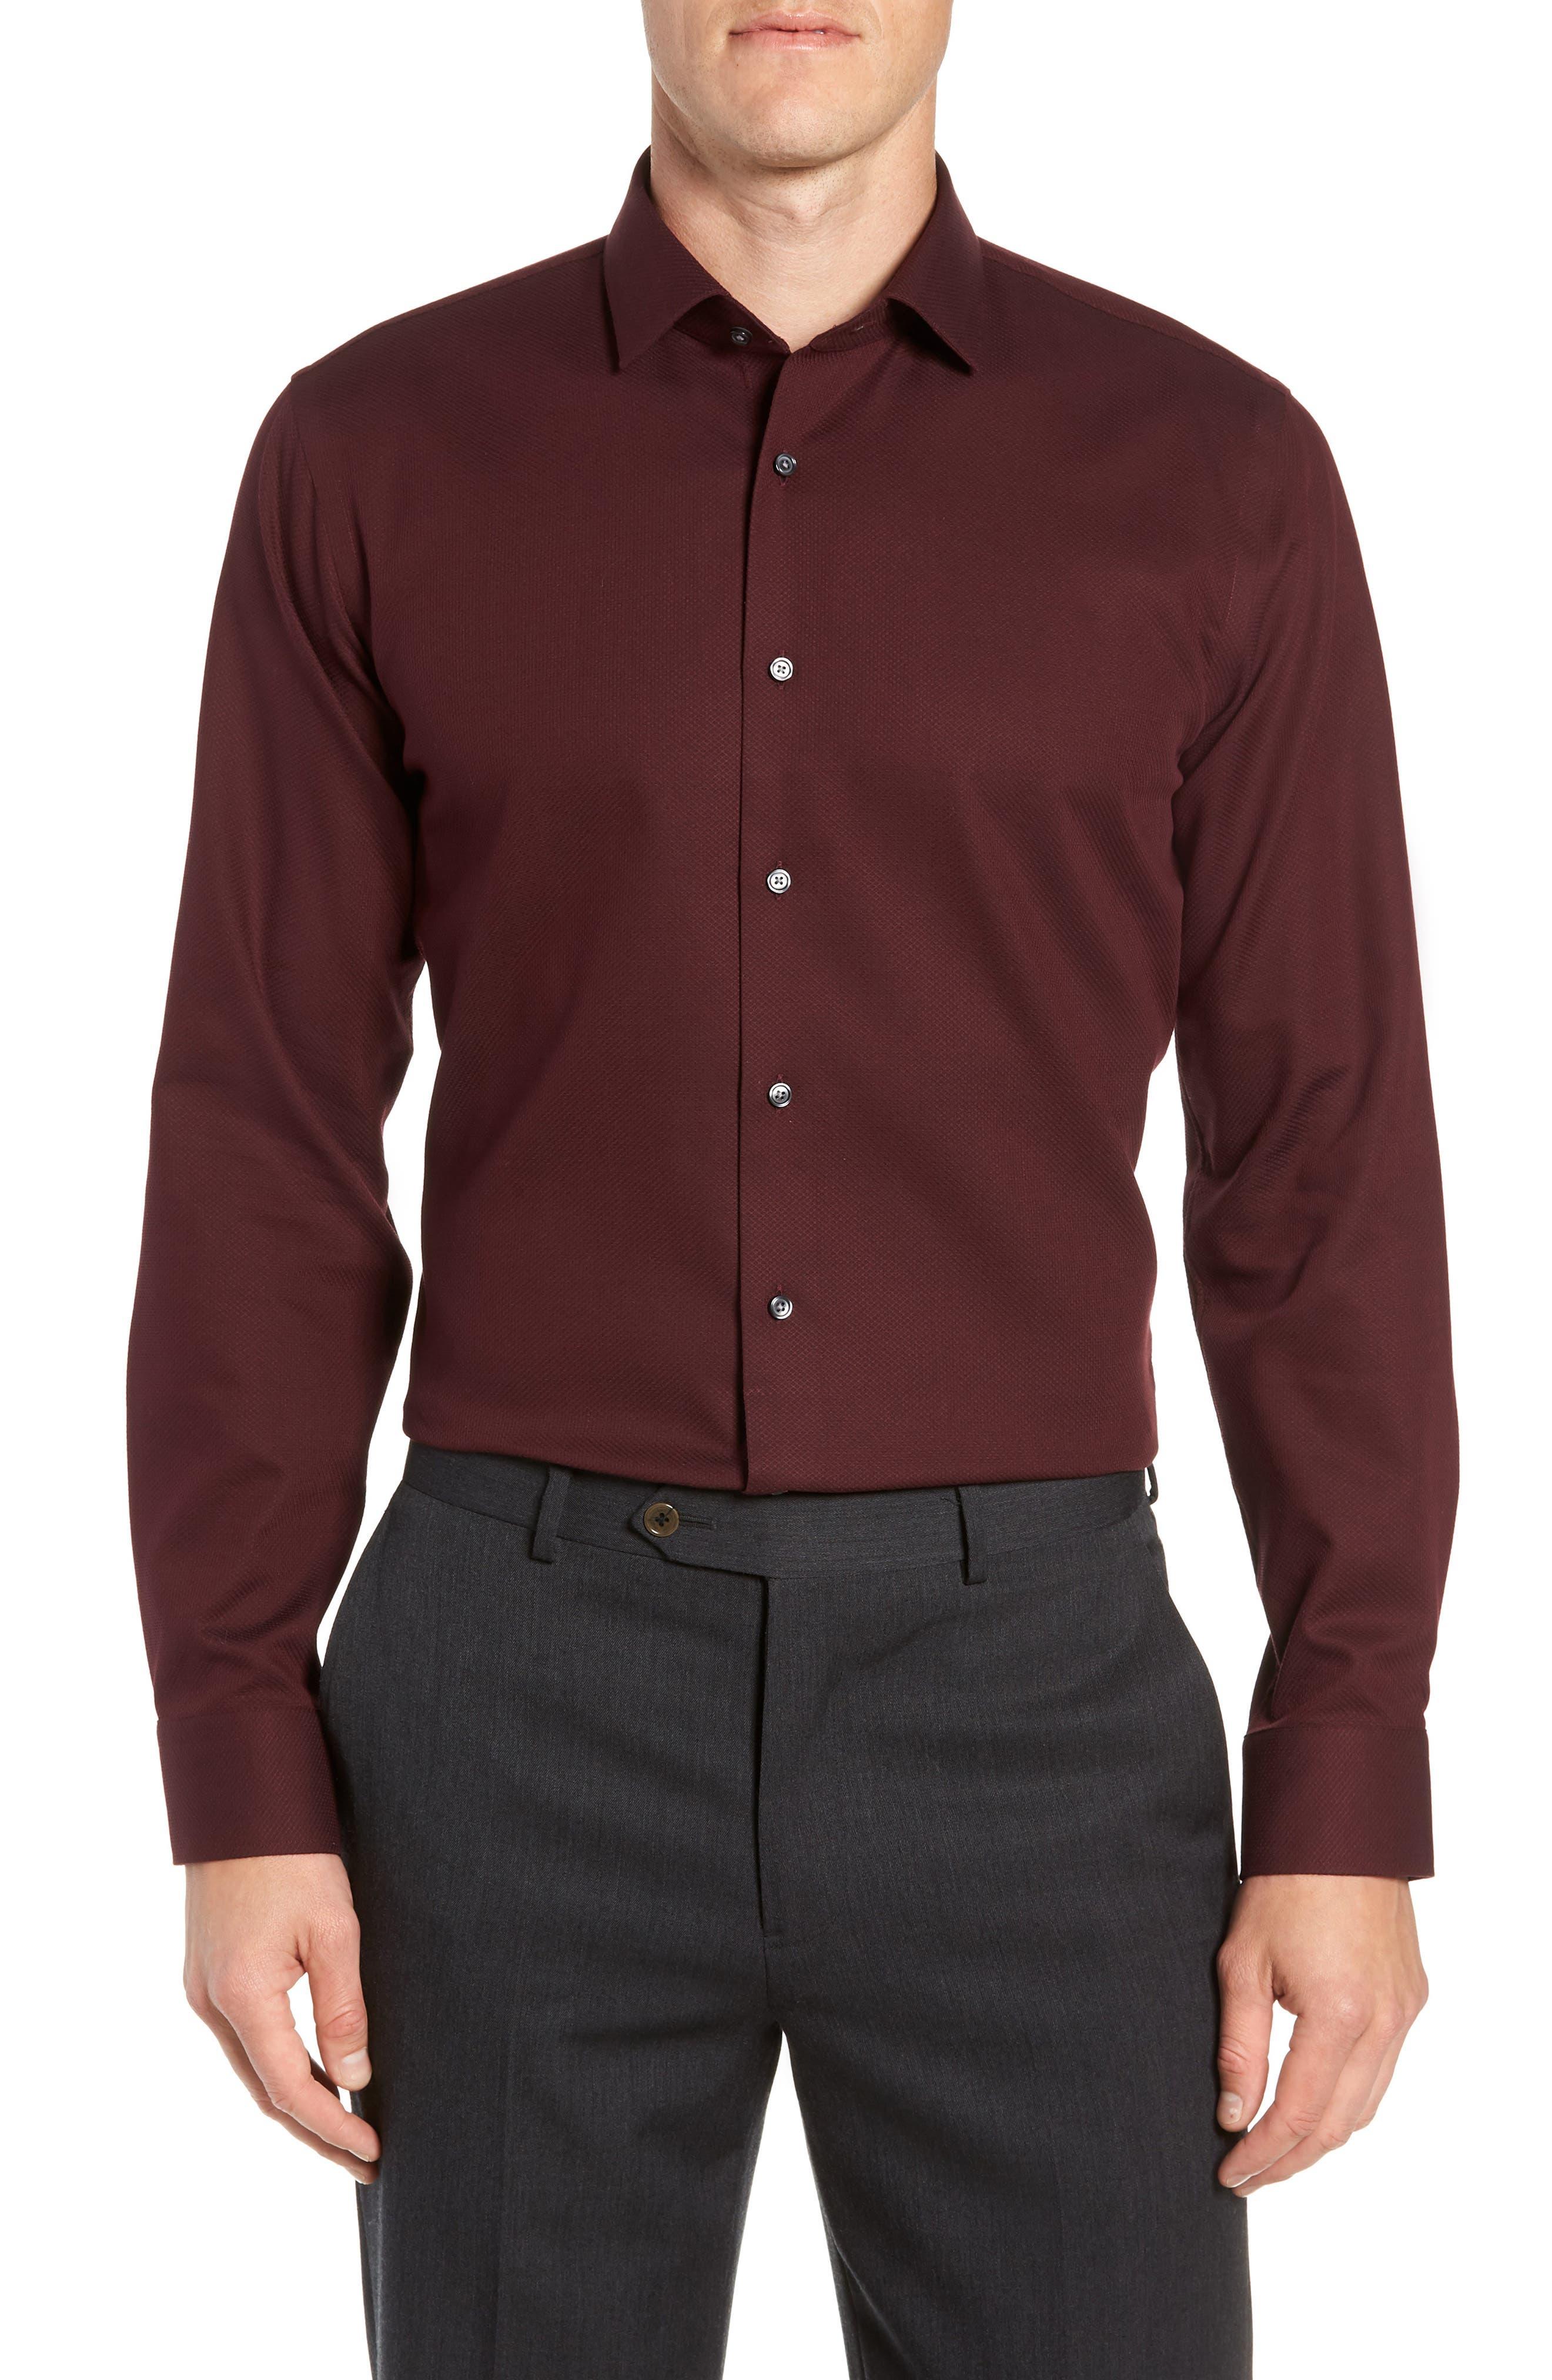 Trim Fit Non-Iron Solid Dress Shirt,                             Main thumbnail 1, color,                             BURGUNDY ROYALE